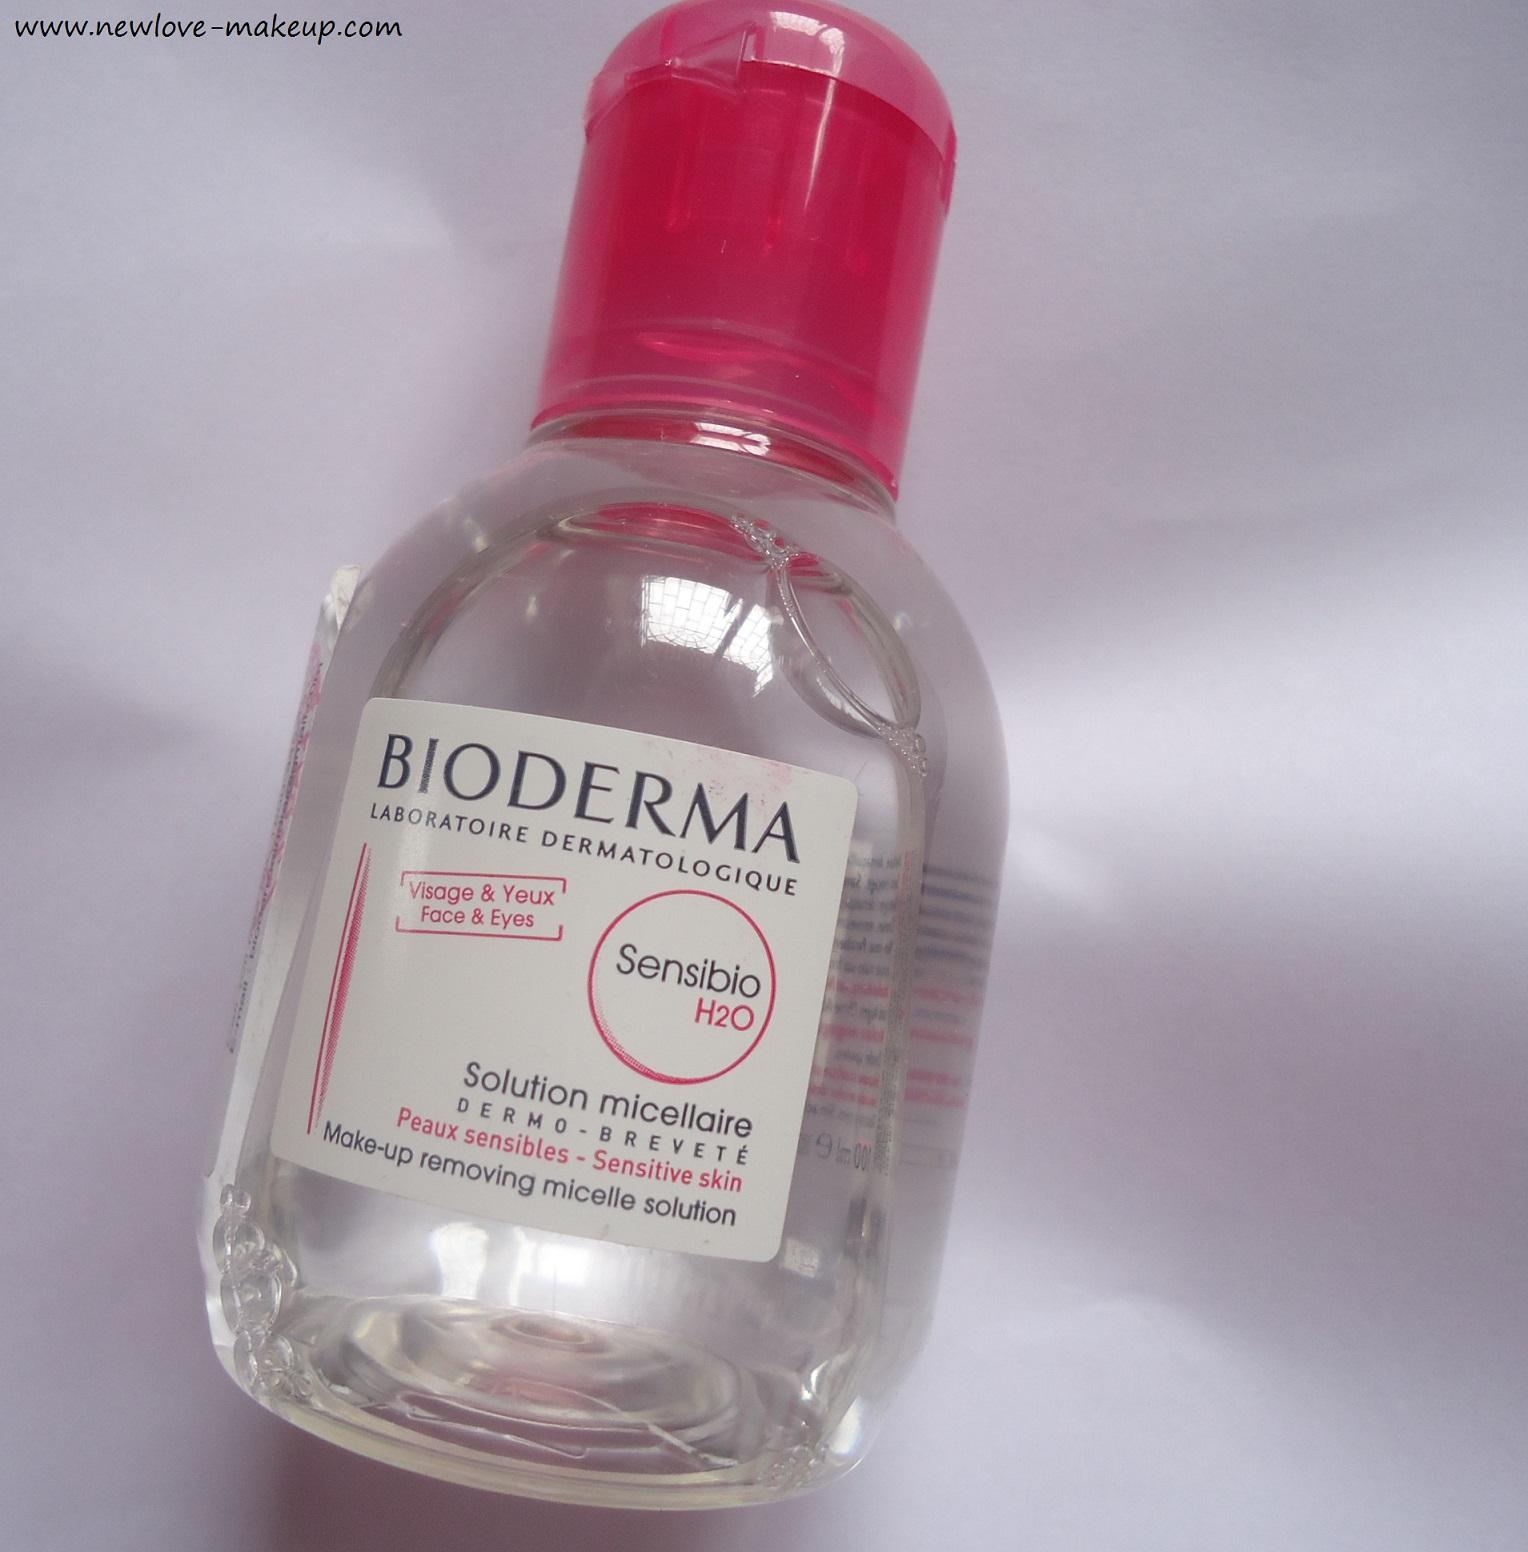 Bioderma Sensibio H2O Micellar Cleansing Water Review – New Love ...